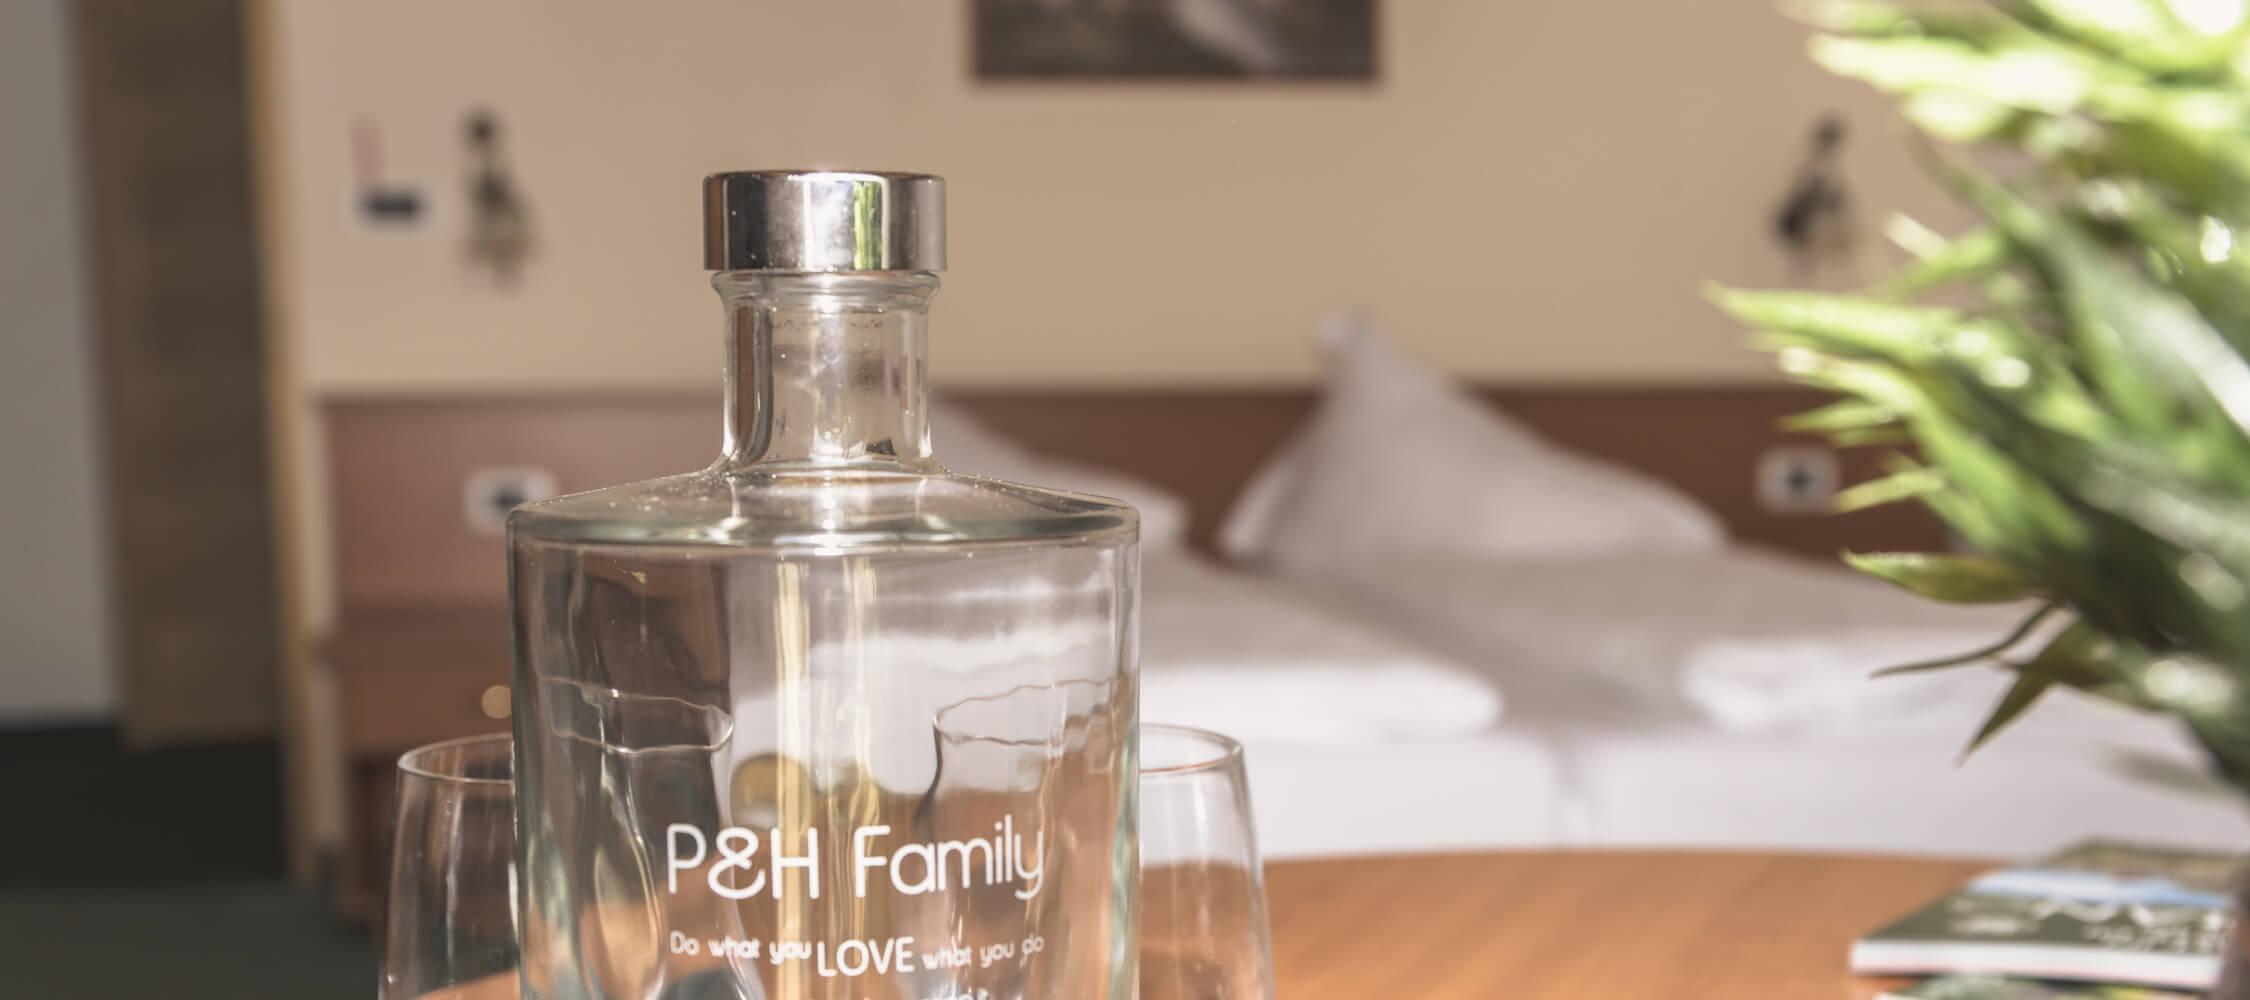 Hotel-Villa-Laurus-Merano-Rooms-Doppelzimmer-Flair-Detail-Anguane-7014-2250x1000